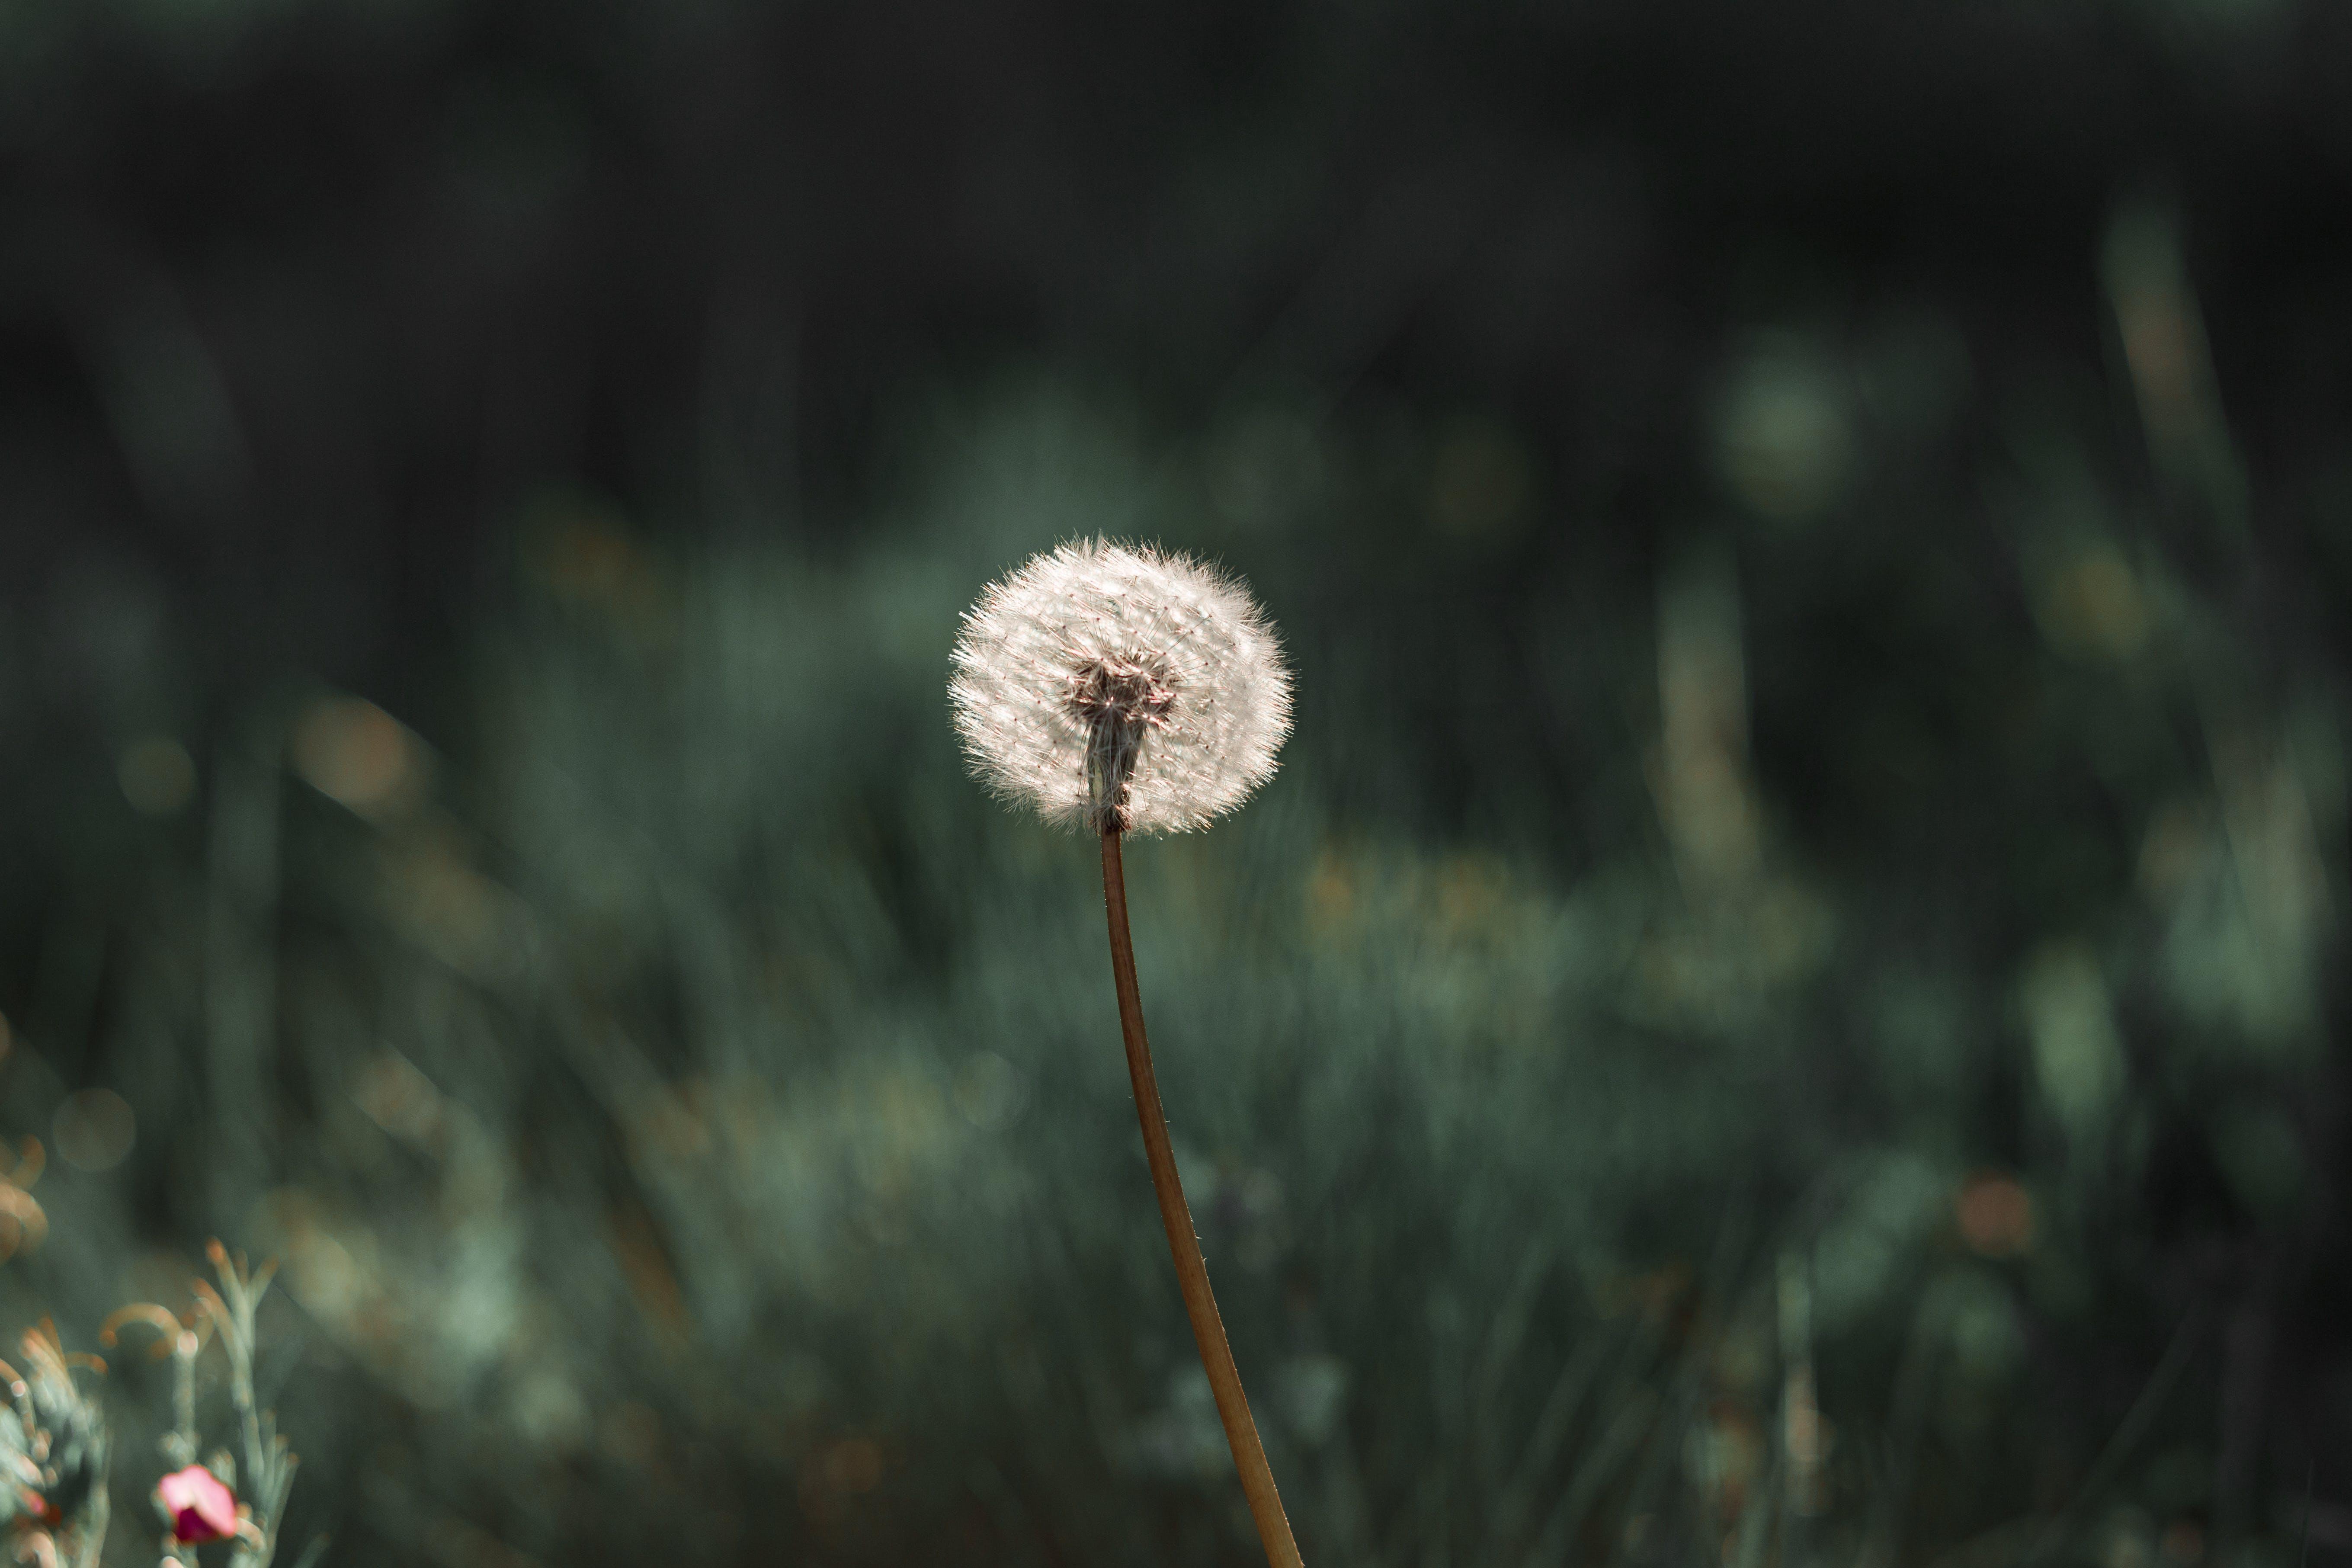 Photography Of Dandelion